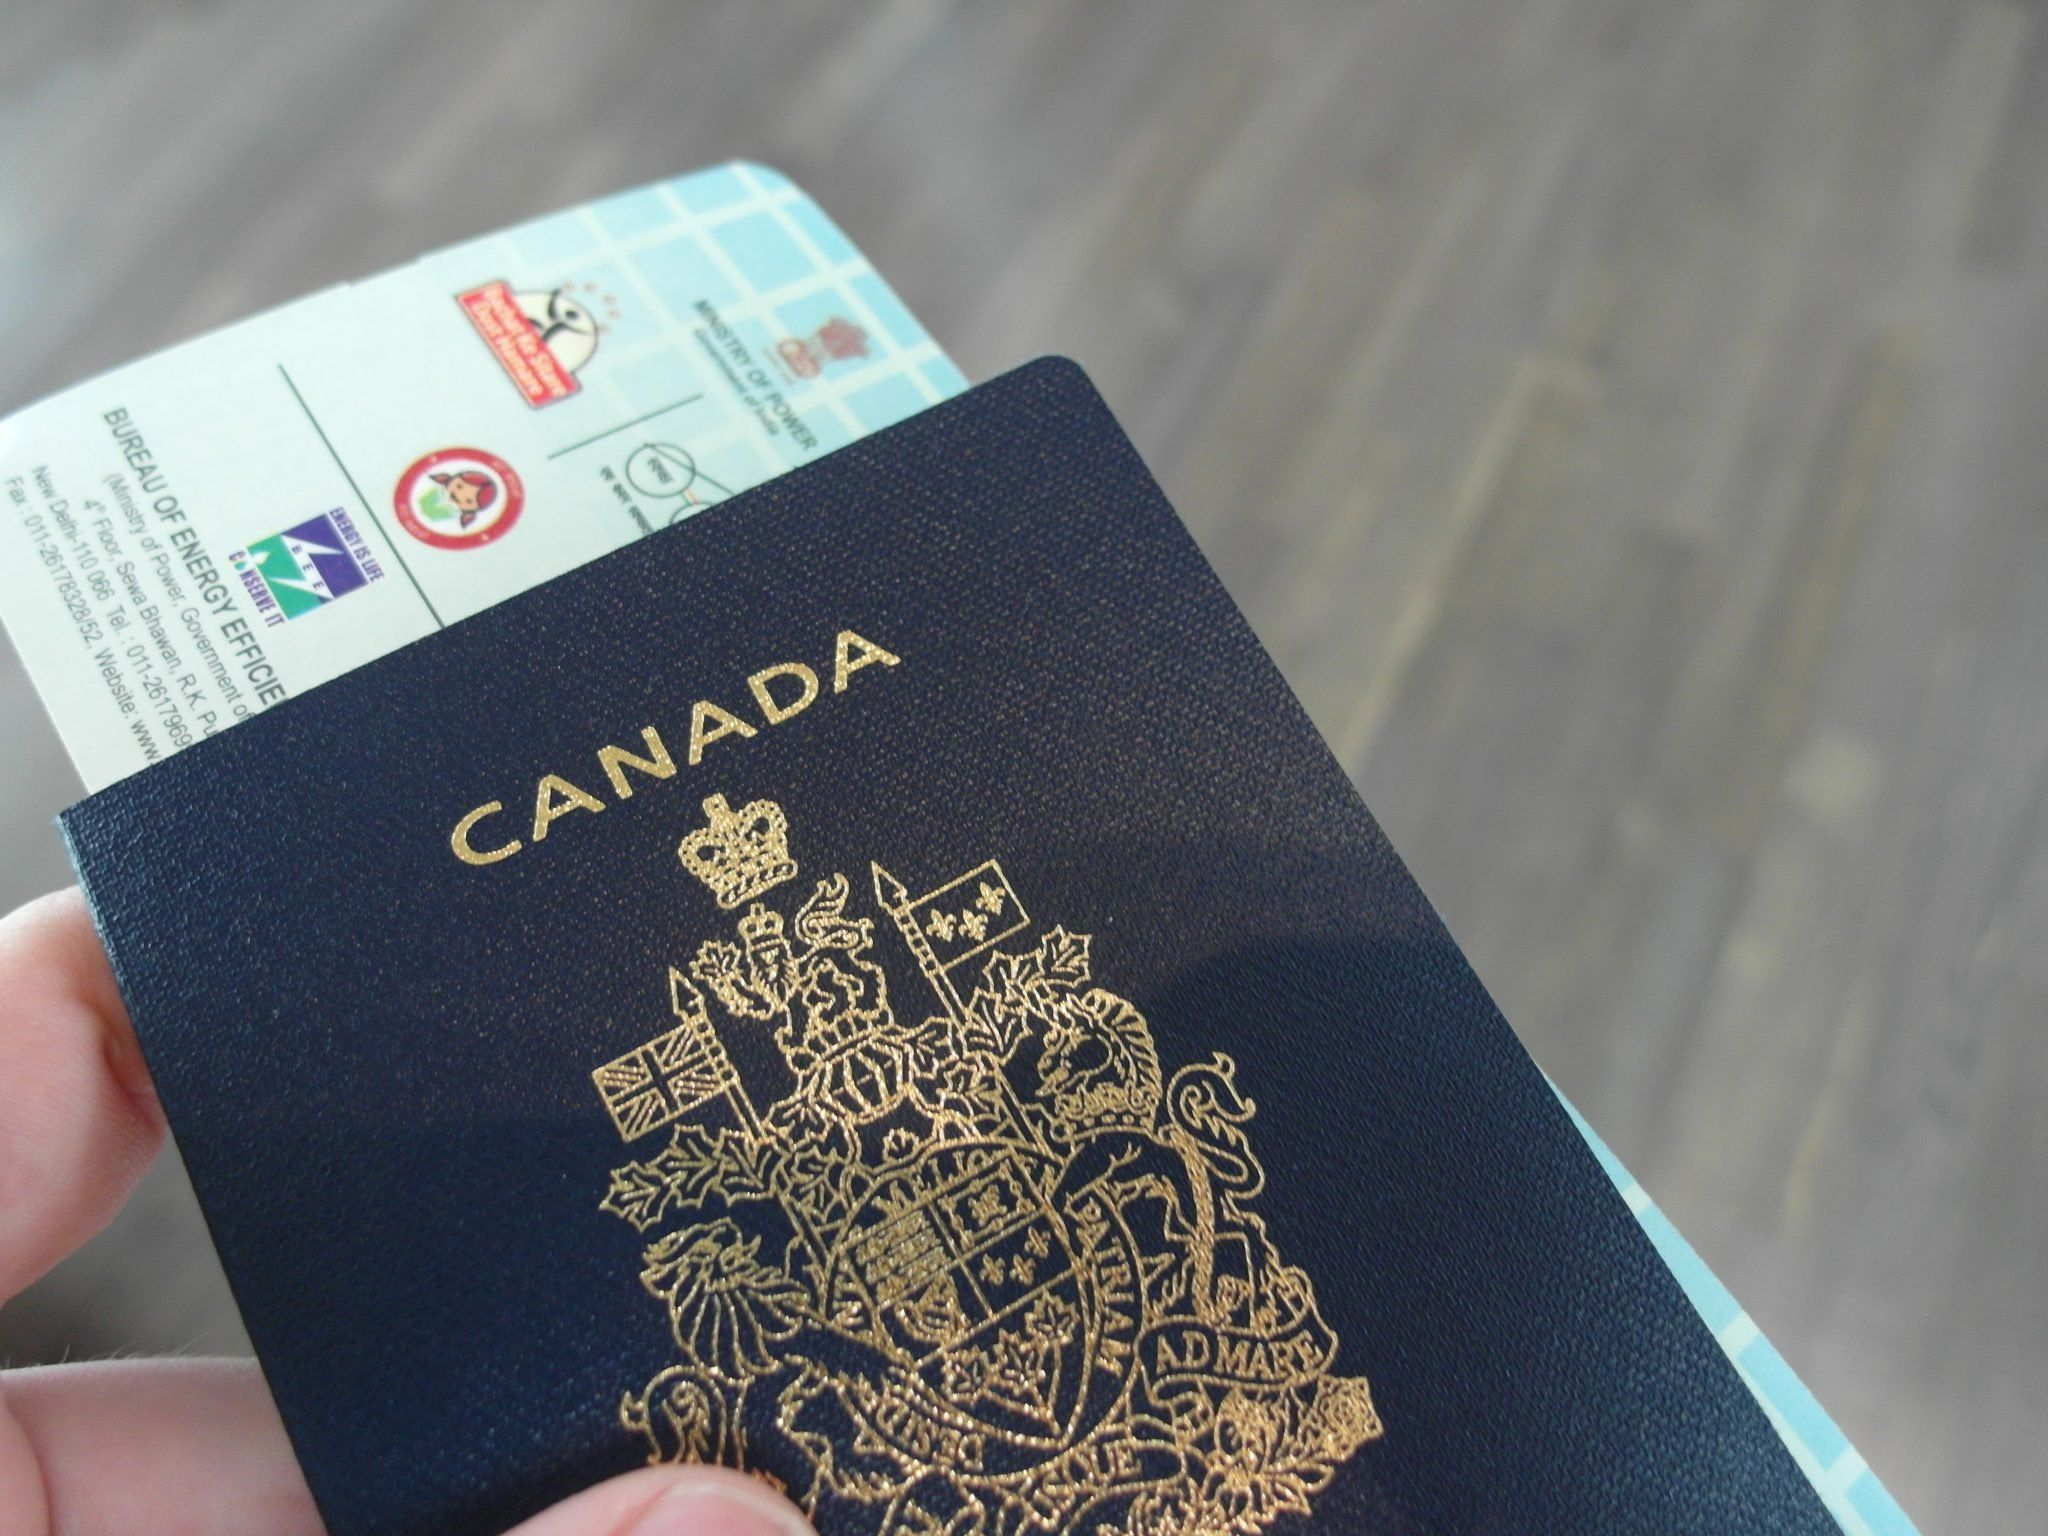 13a2e39e6f74a61ab830b7ce86de9089 - Where To Get Application For Canadian Passport